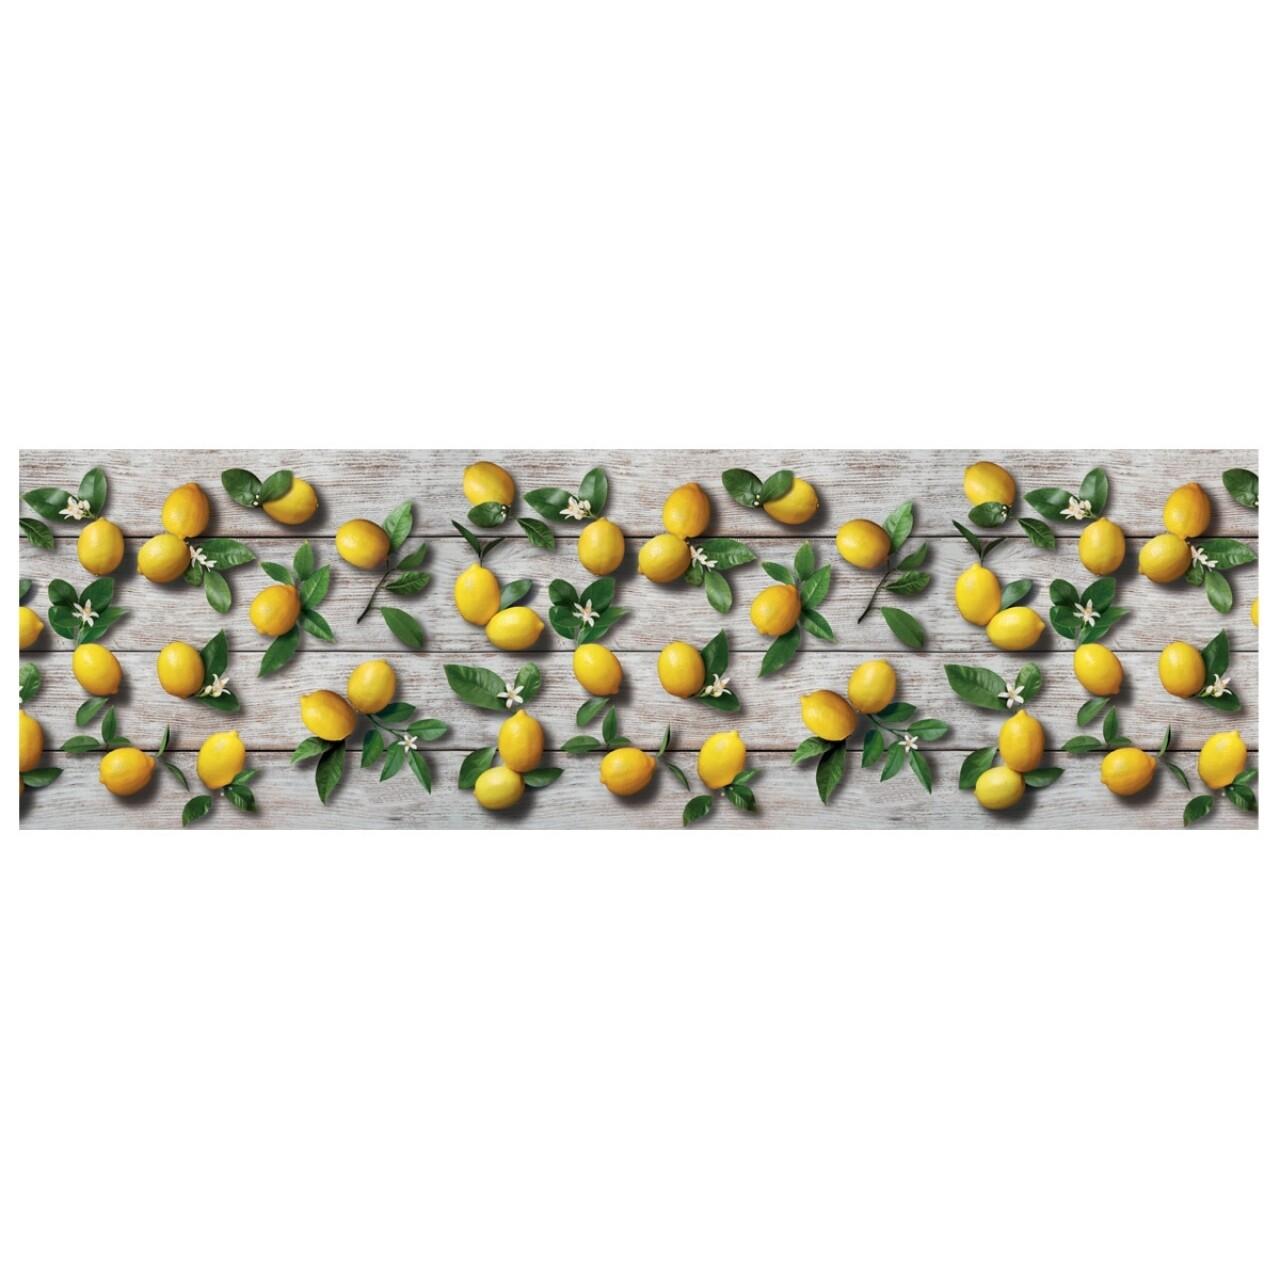 Covor rezistent Webtappeti Limoni 58 x 115 cm, gri/galben/verde